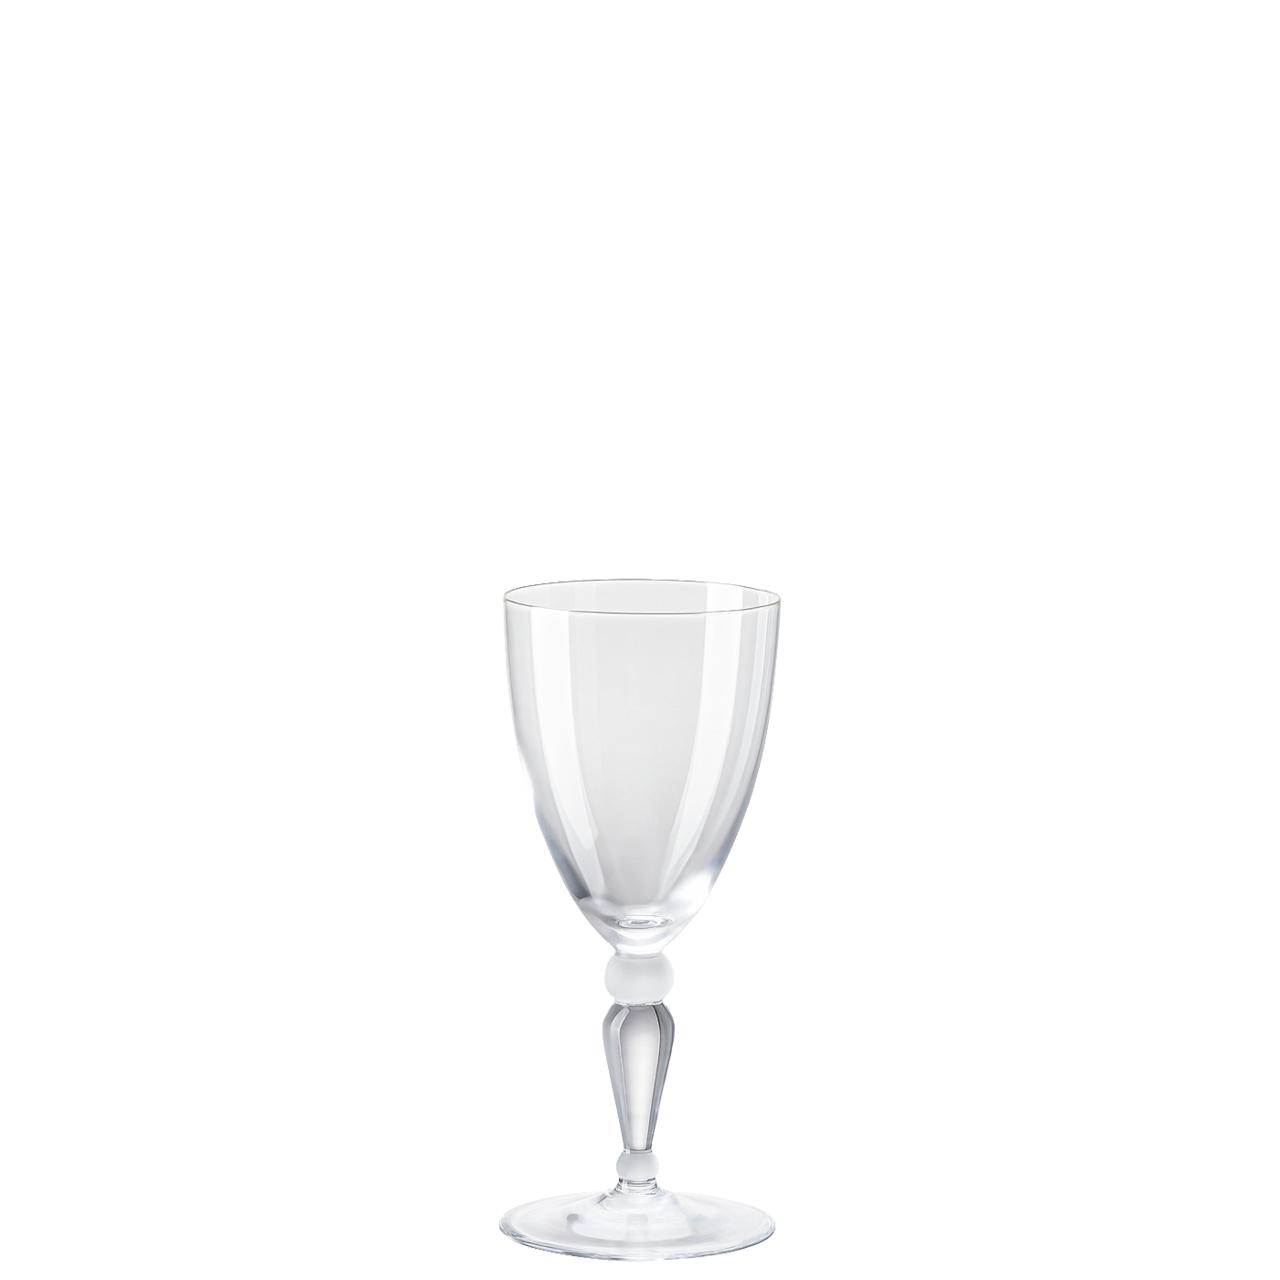 Weinglas Midas Glas Rosenthal